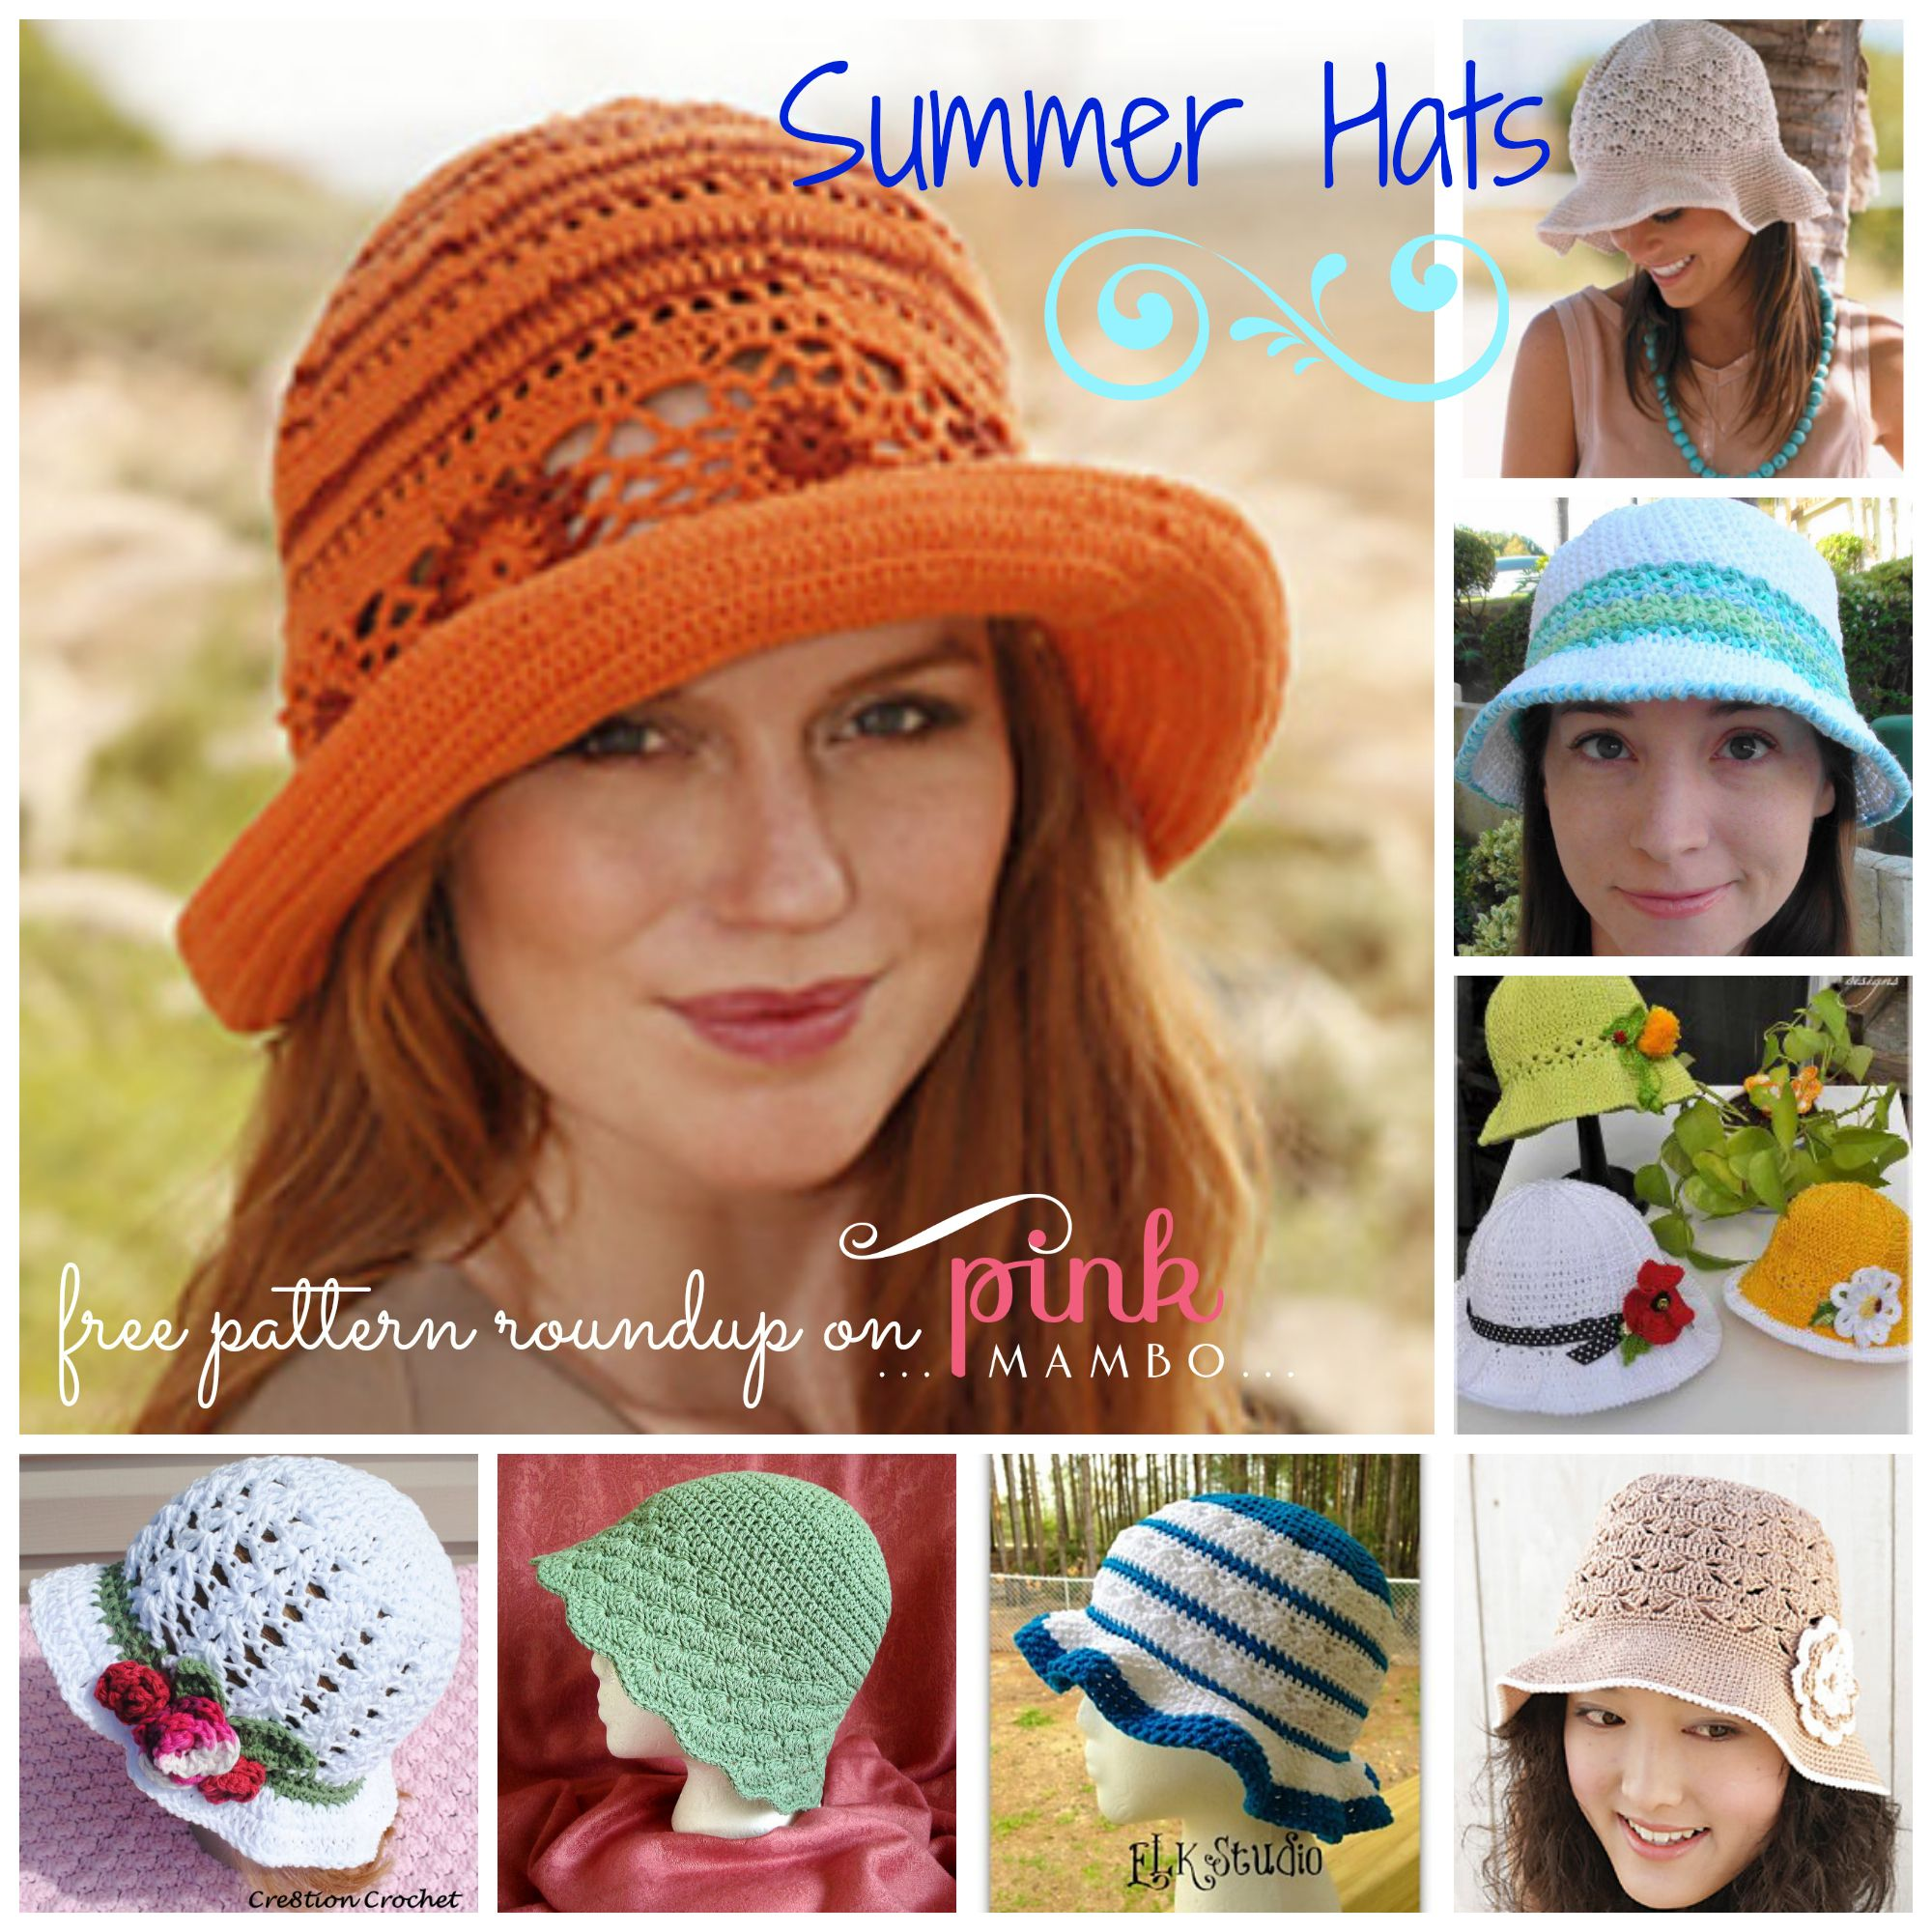 Crochet Summer Hats 8 Free Patterns! | diy | Pinterest | Sonne ...